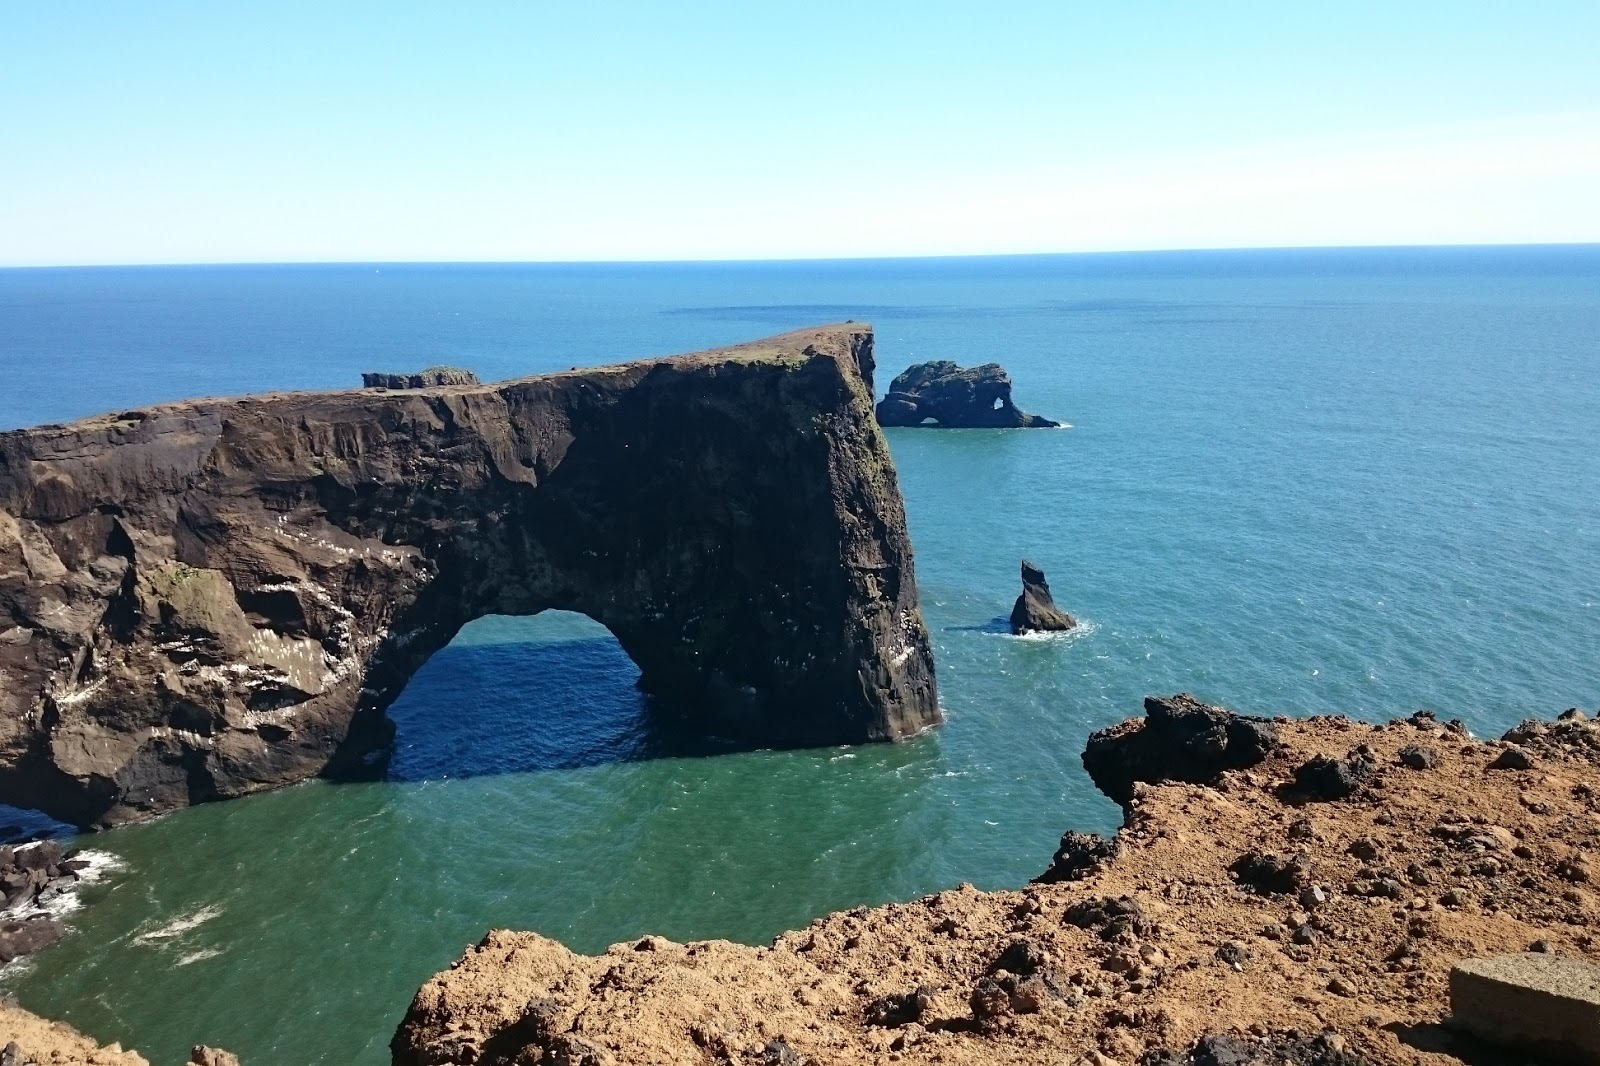 Dyrholaey Islandia, cypel, Islandia, krajobraz, morze, ocean, skały